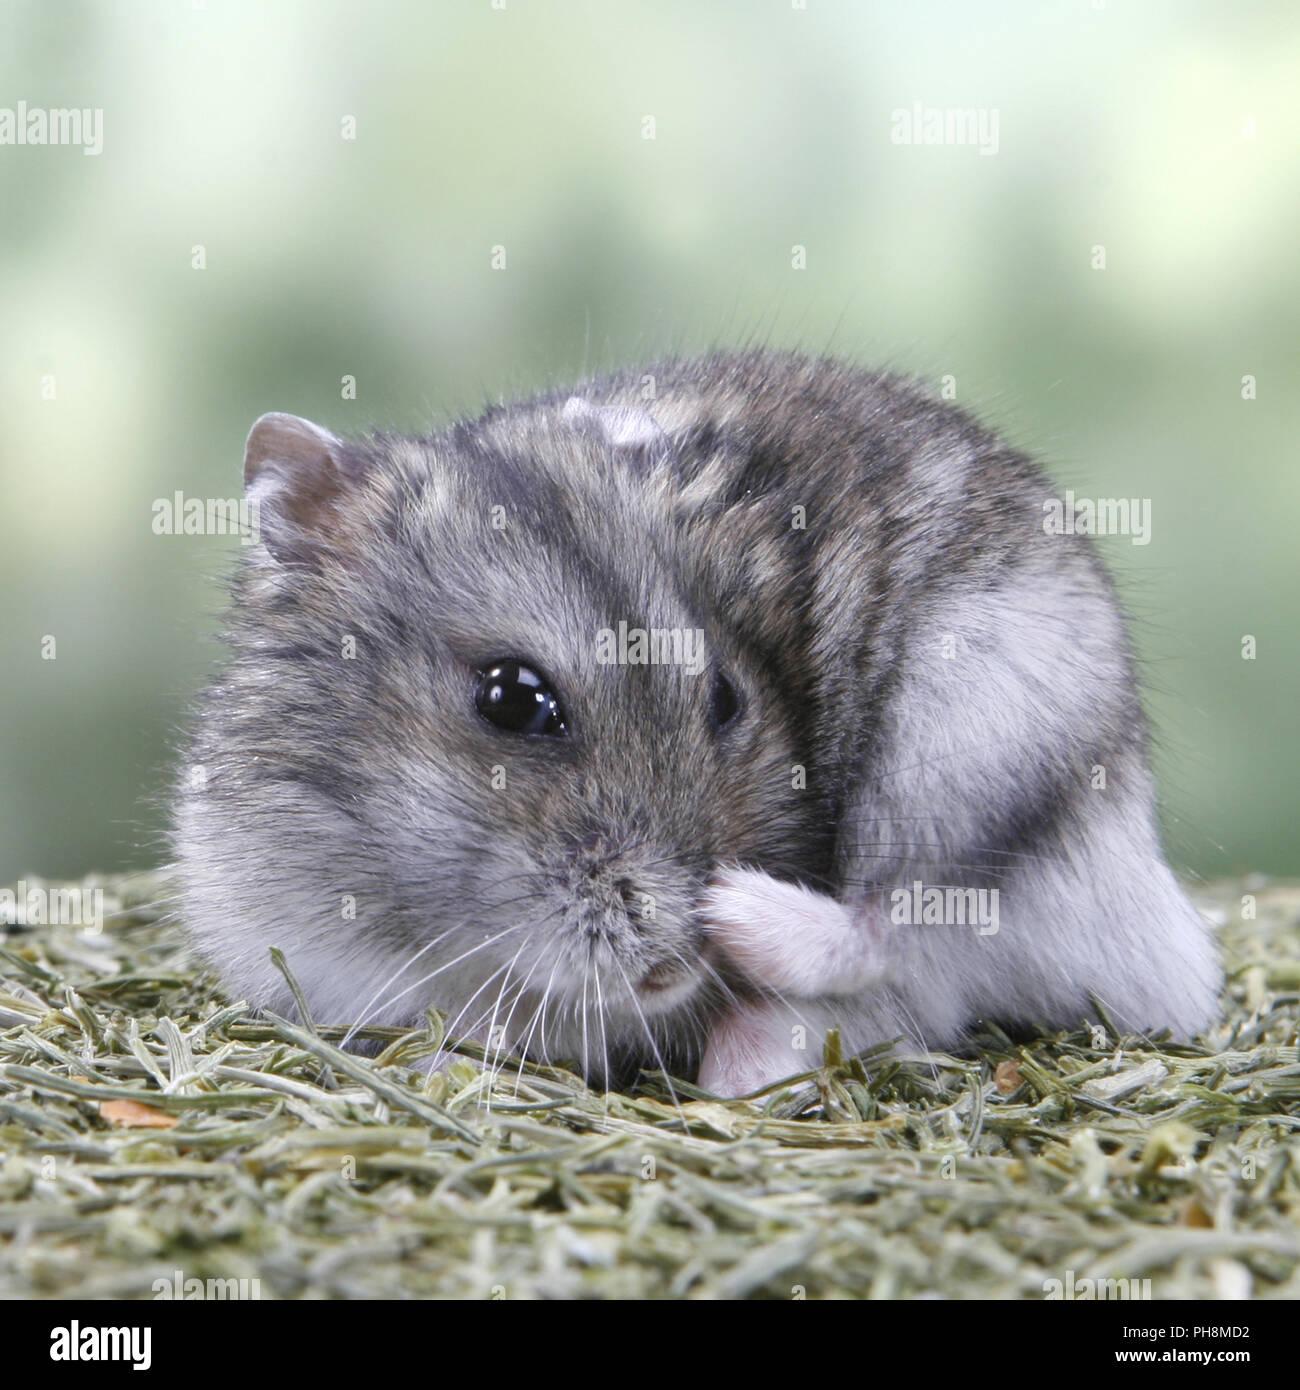 Winter White Russian Dwarf Hamster Stock Photos & Winter